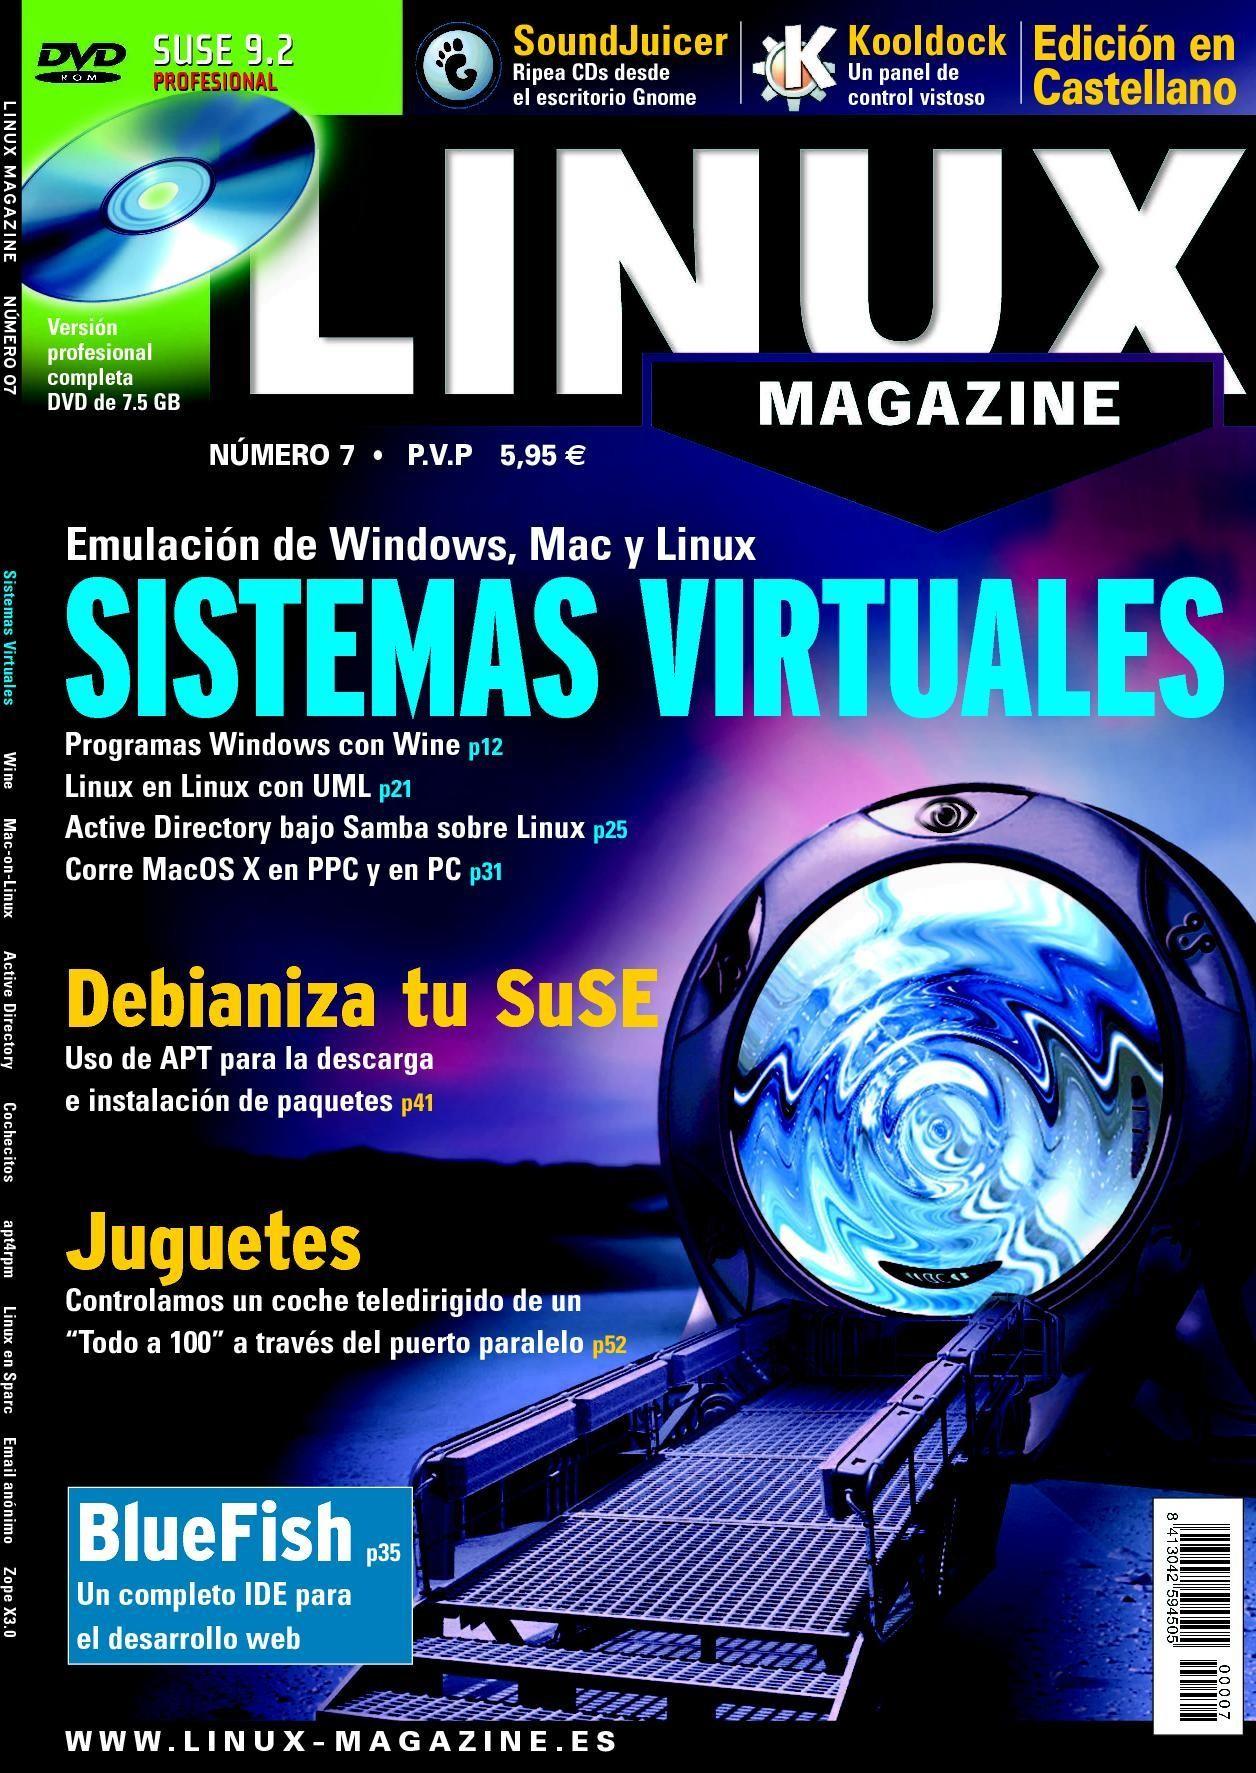 Linux Magazine Edici³n en Castellano Nº 07 by Linux New Media Spain S L issuu